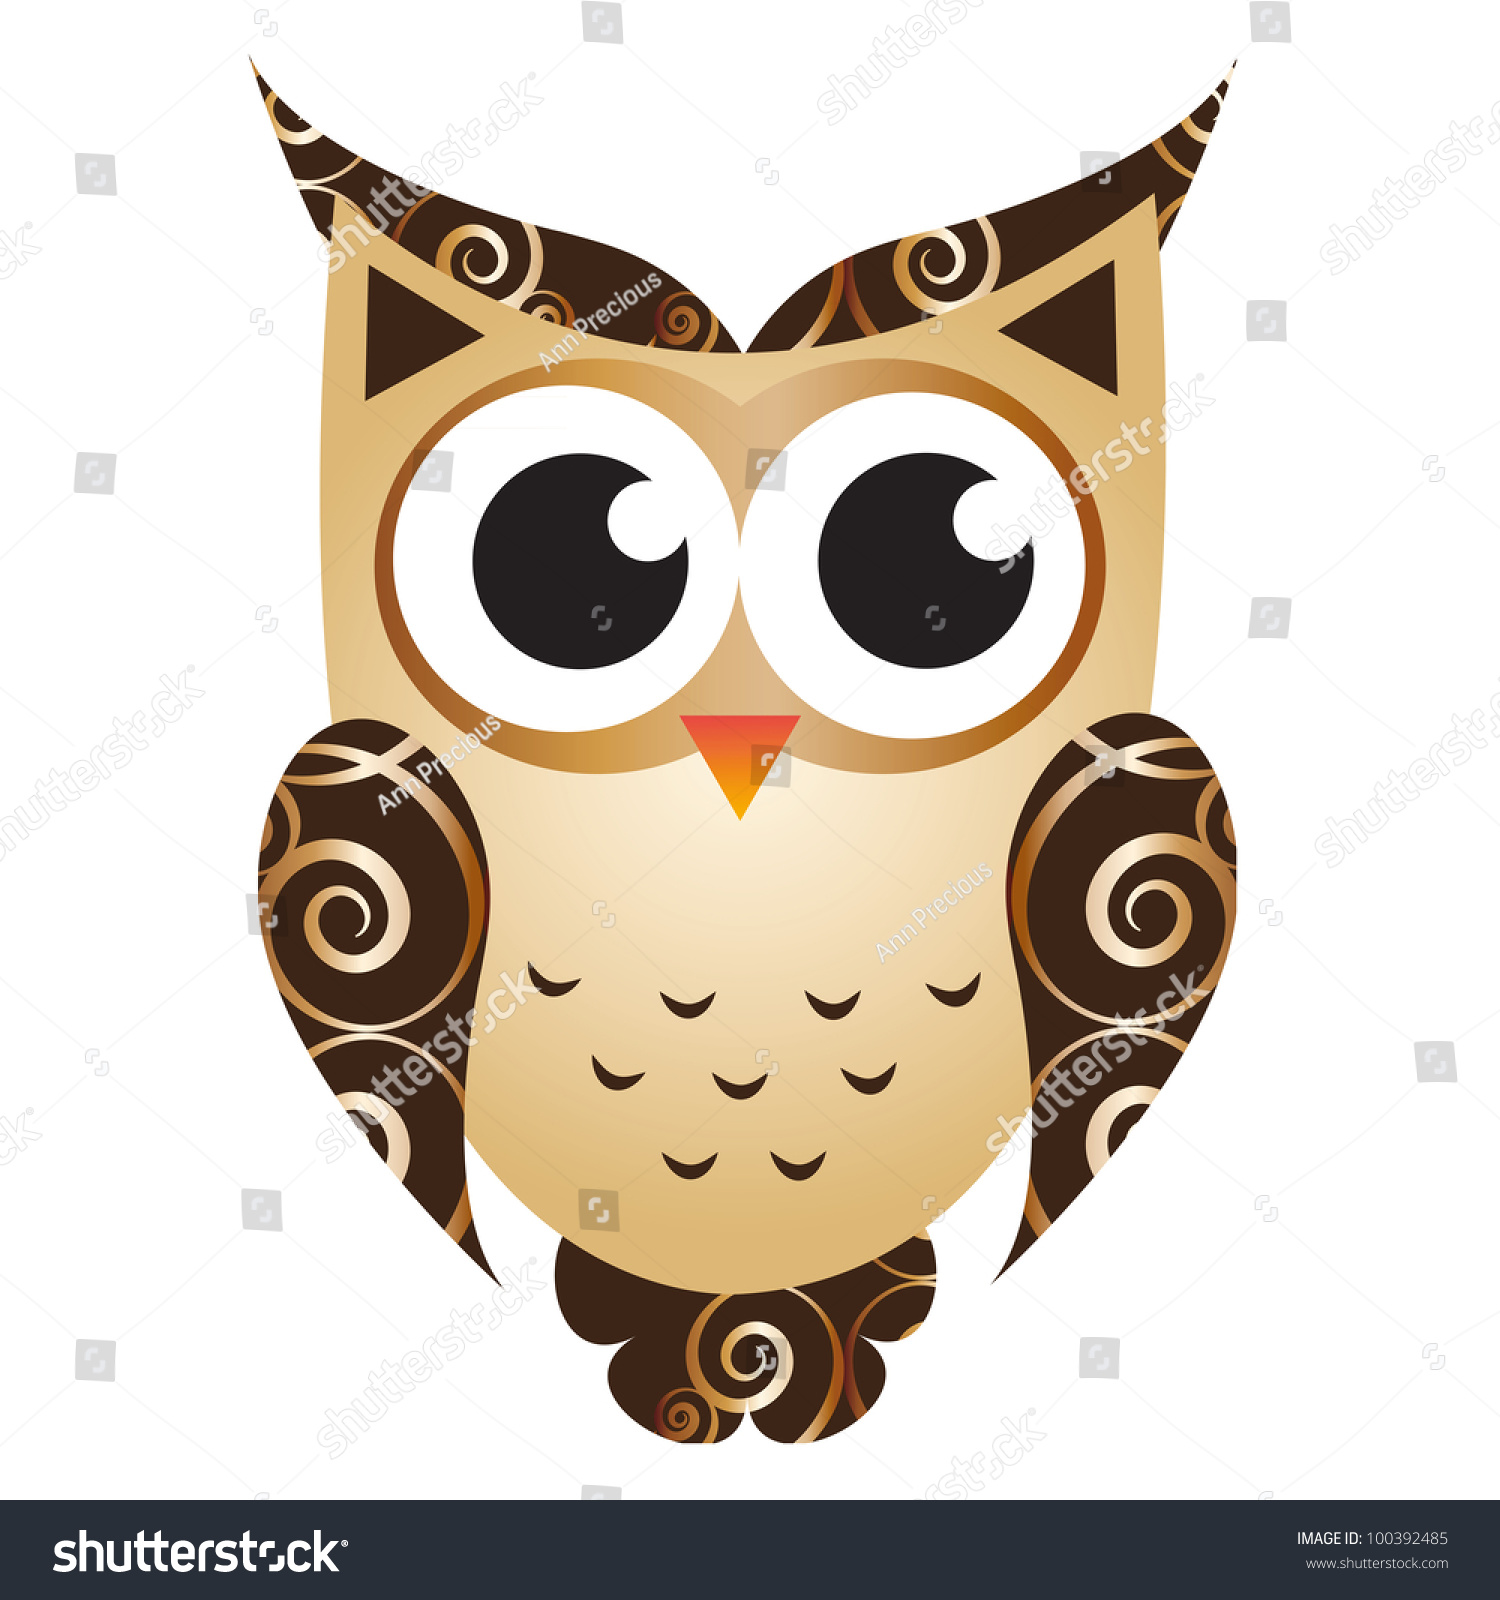 Cartoon Owl Stock Photo 100392485 : Shutterstock